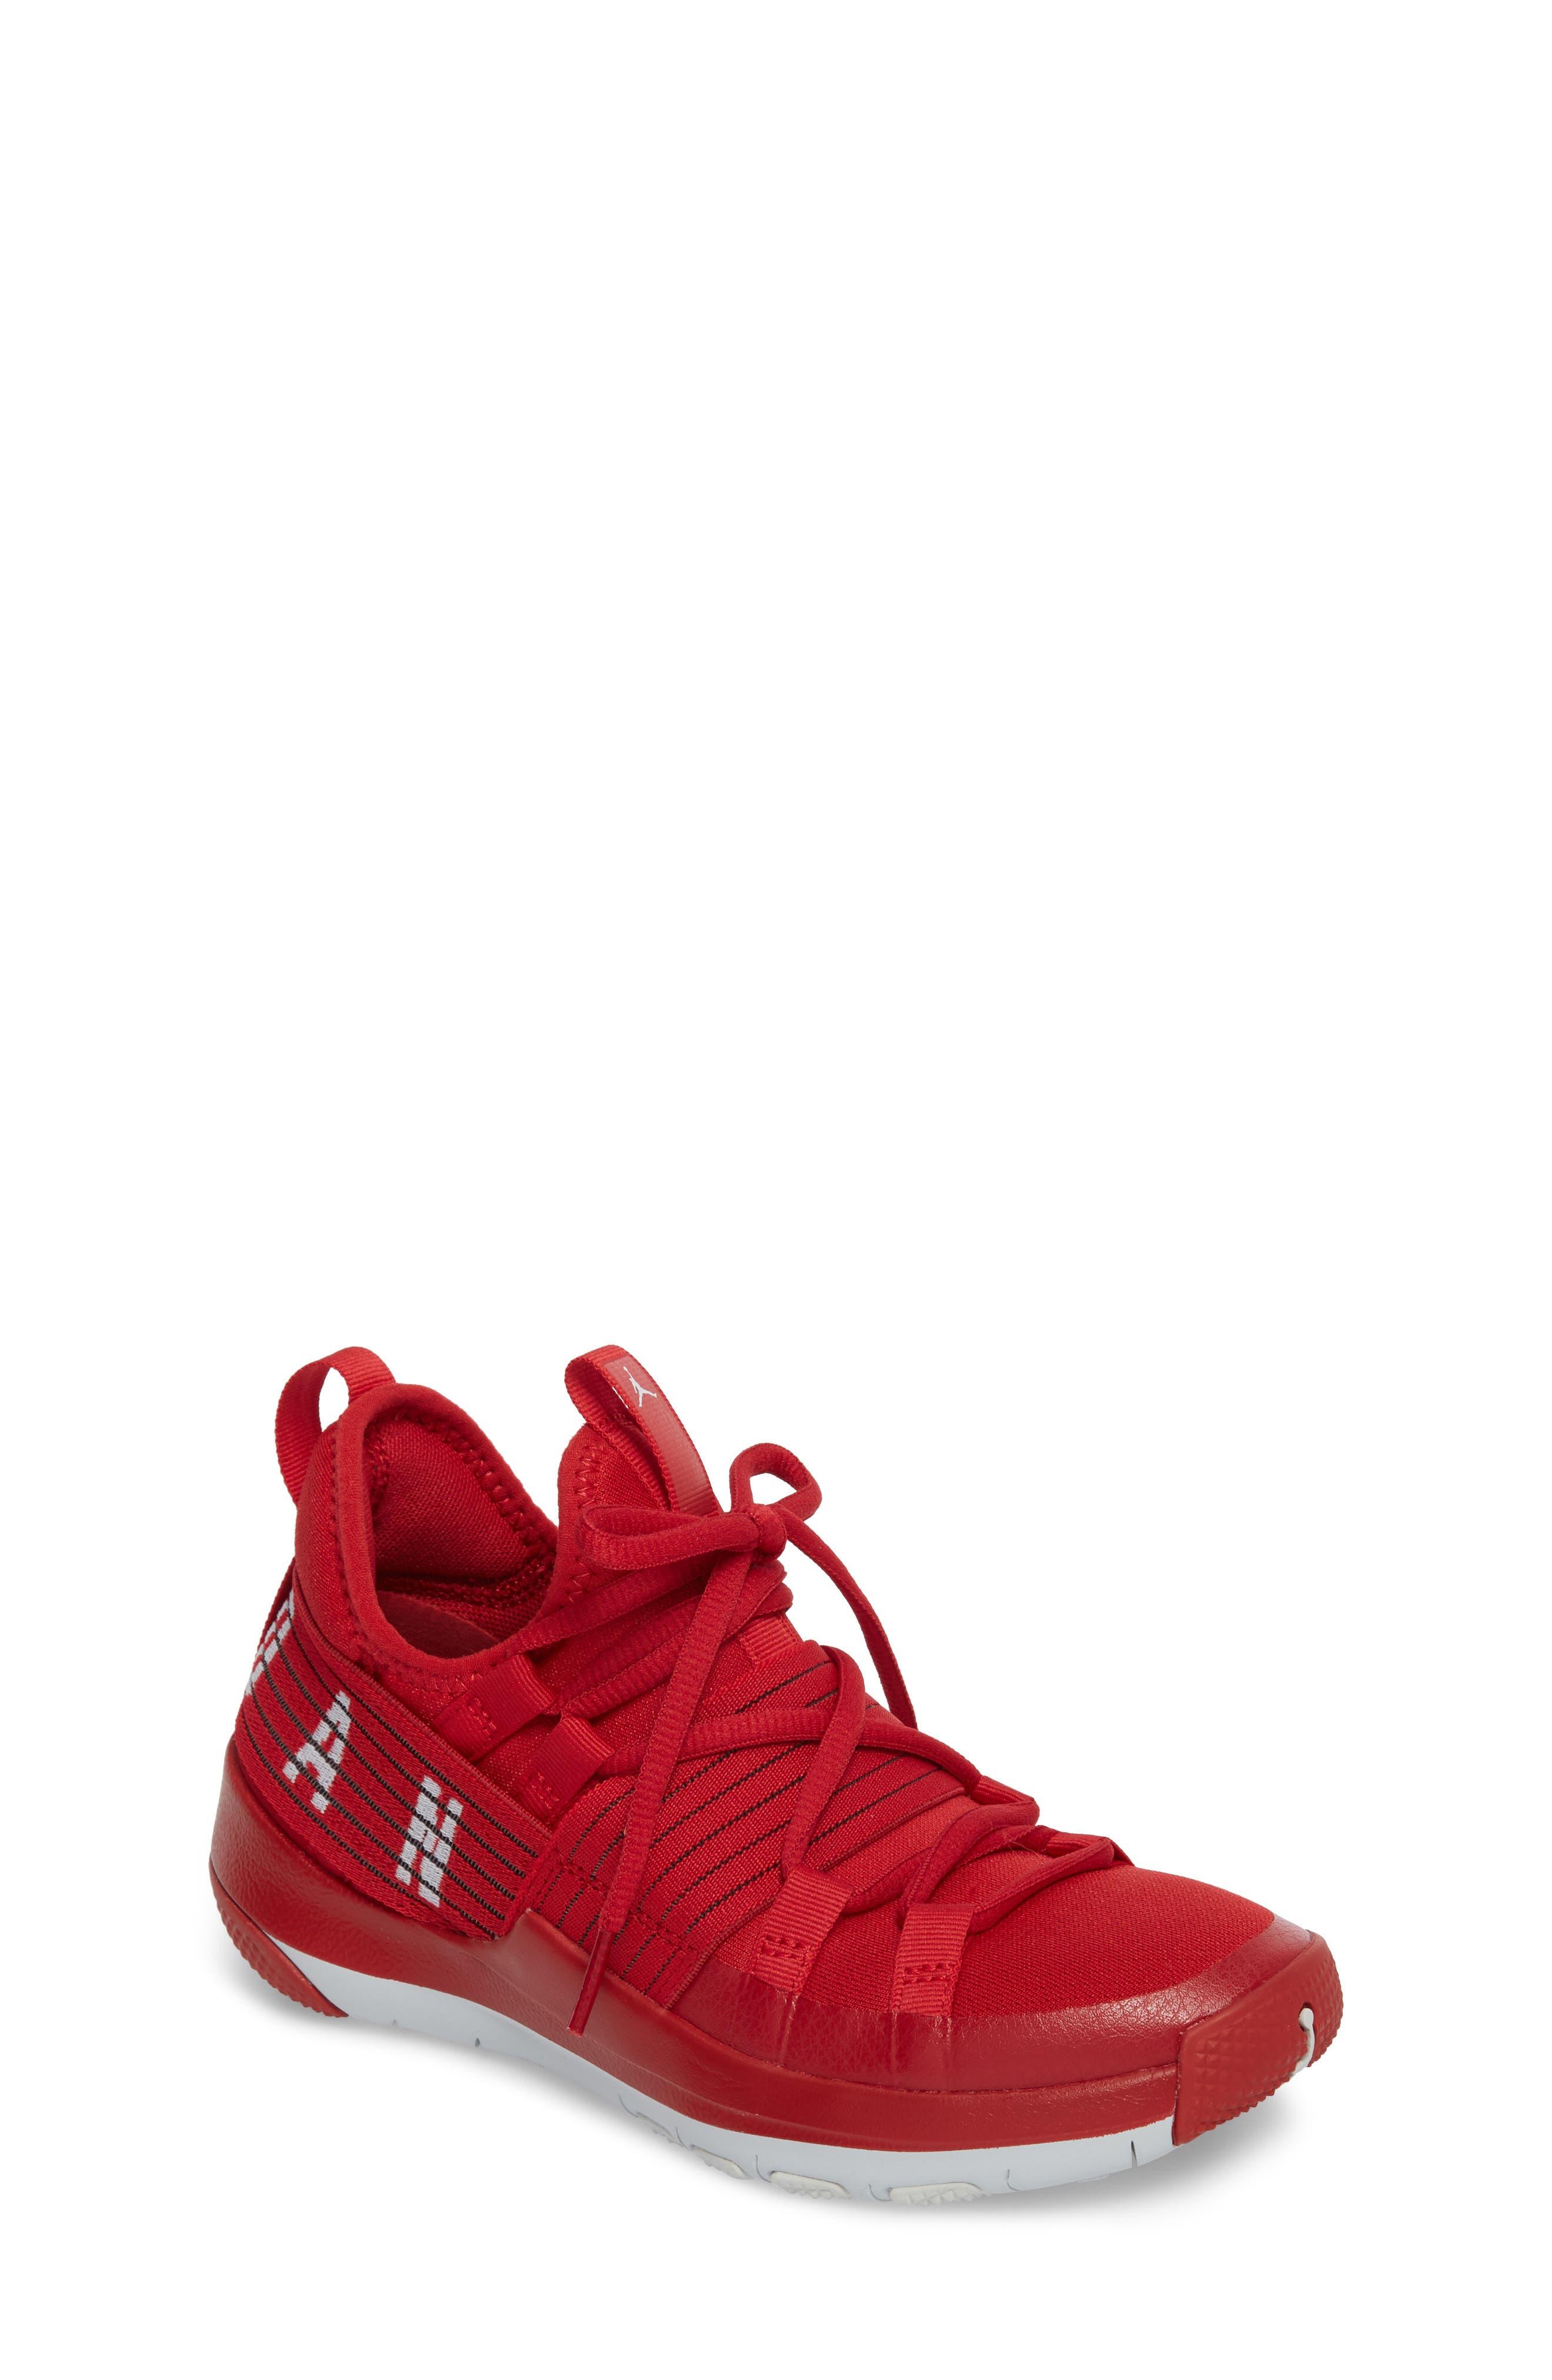 Trainer Pro Training Shoe,                         Main,                         color, Gym Red/ Pure Platinum